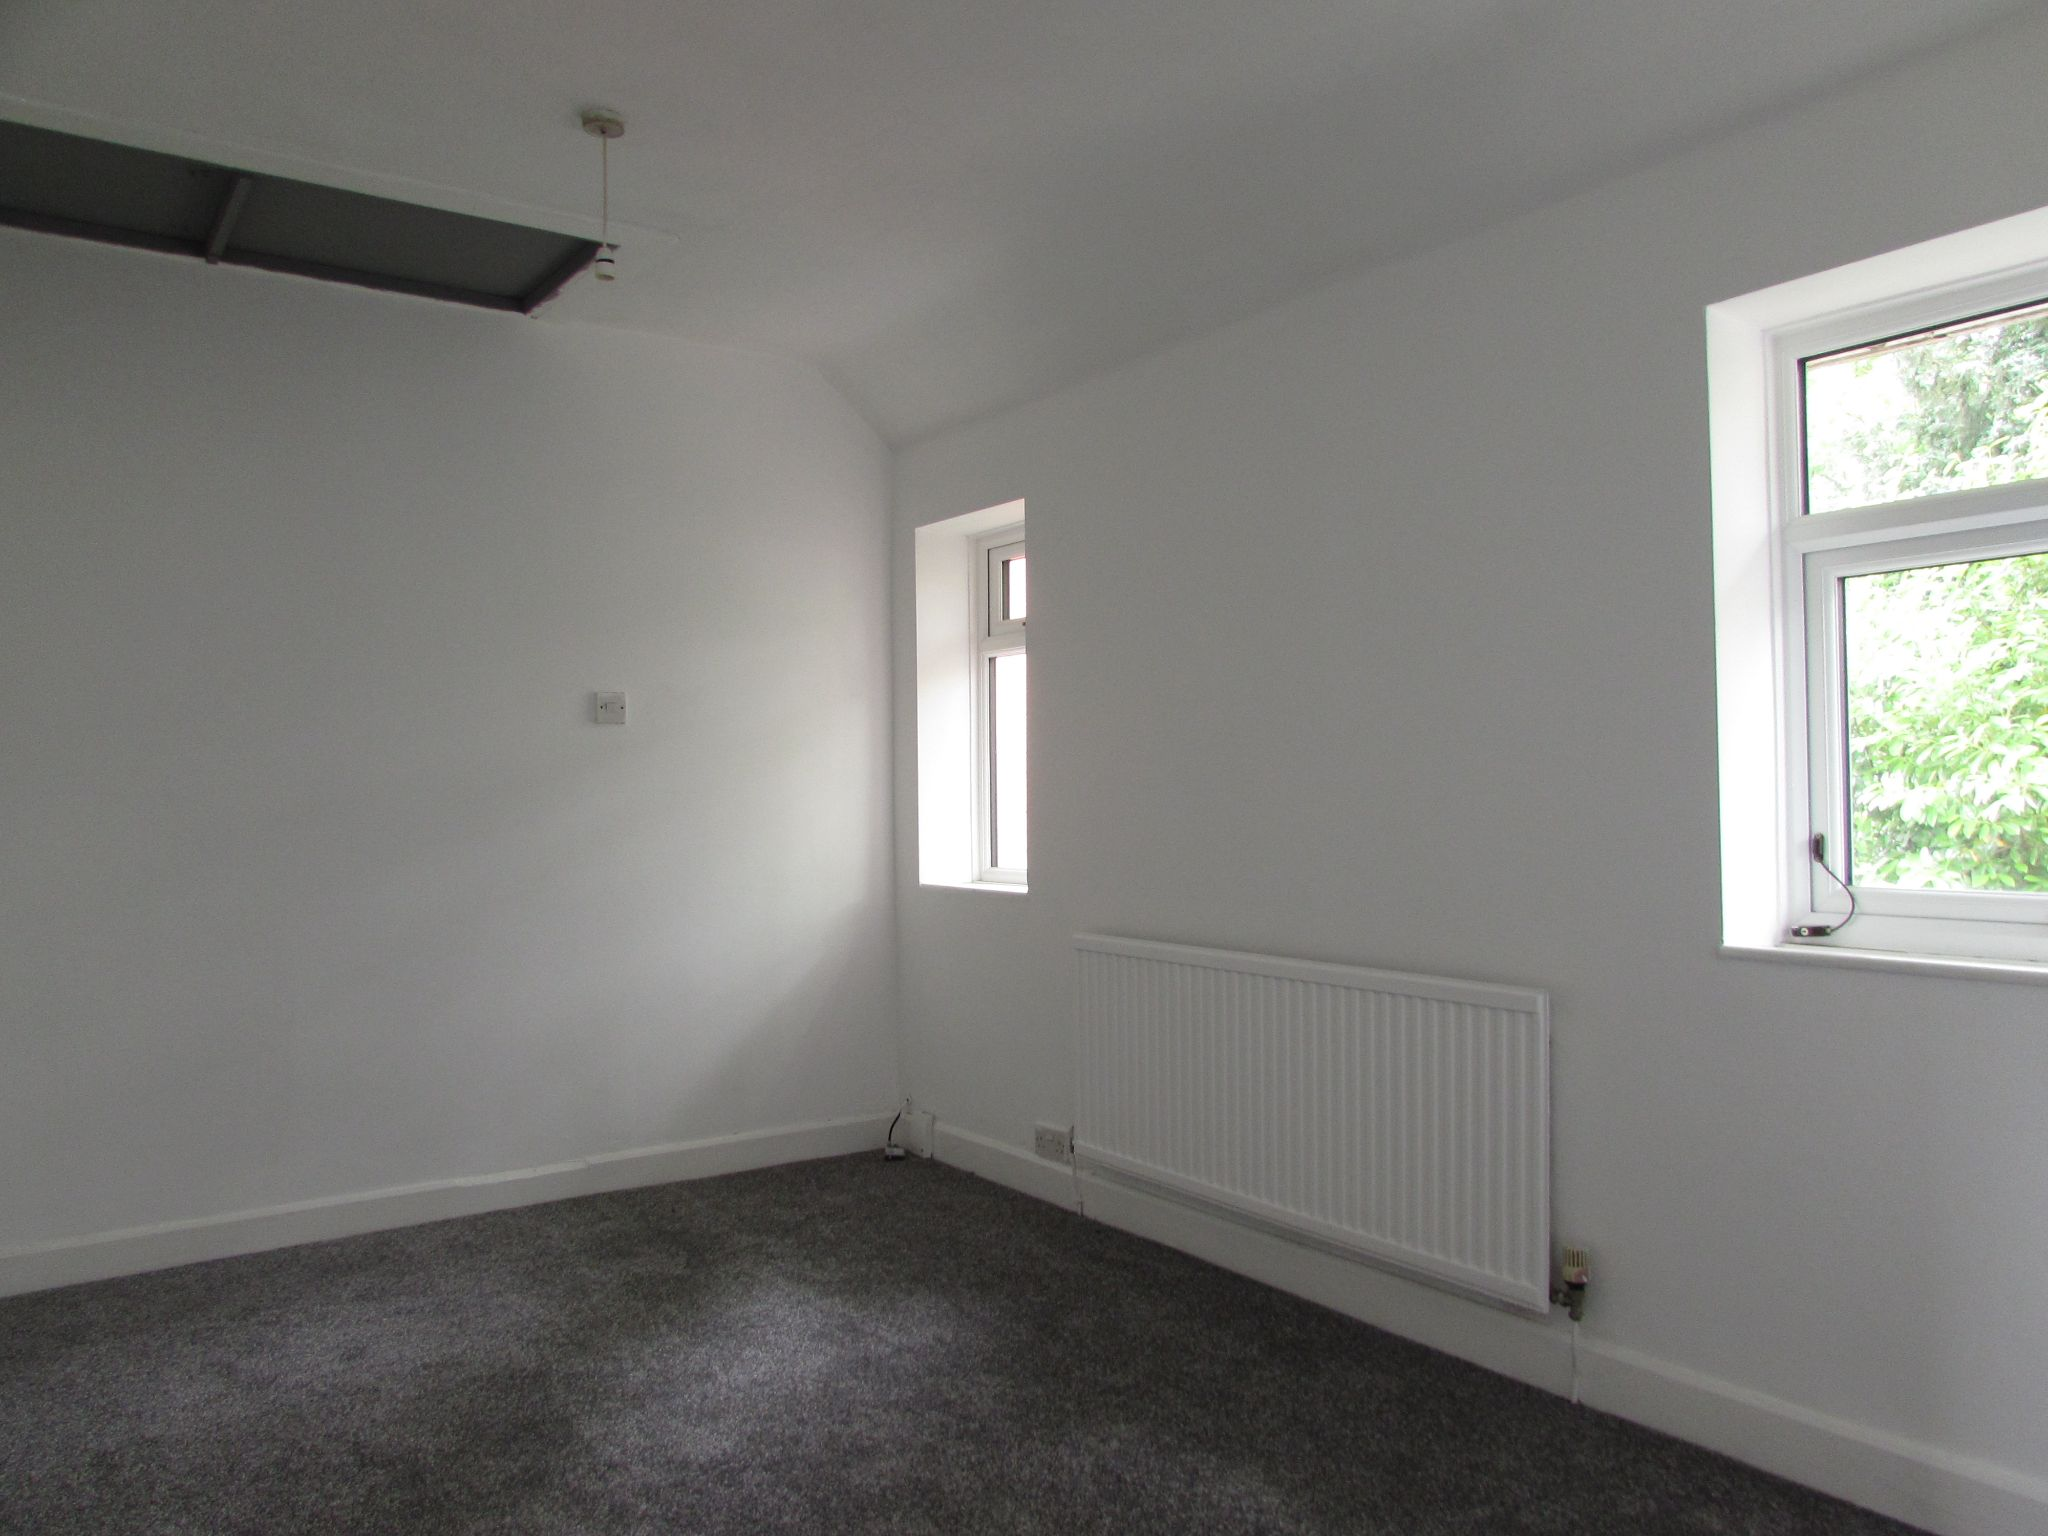 3 Bedroom Mid Terraced House For Sale - REAR BEDROOM